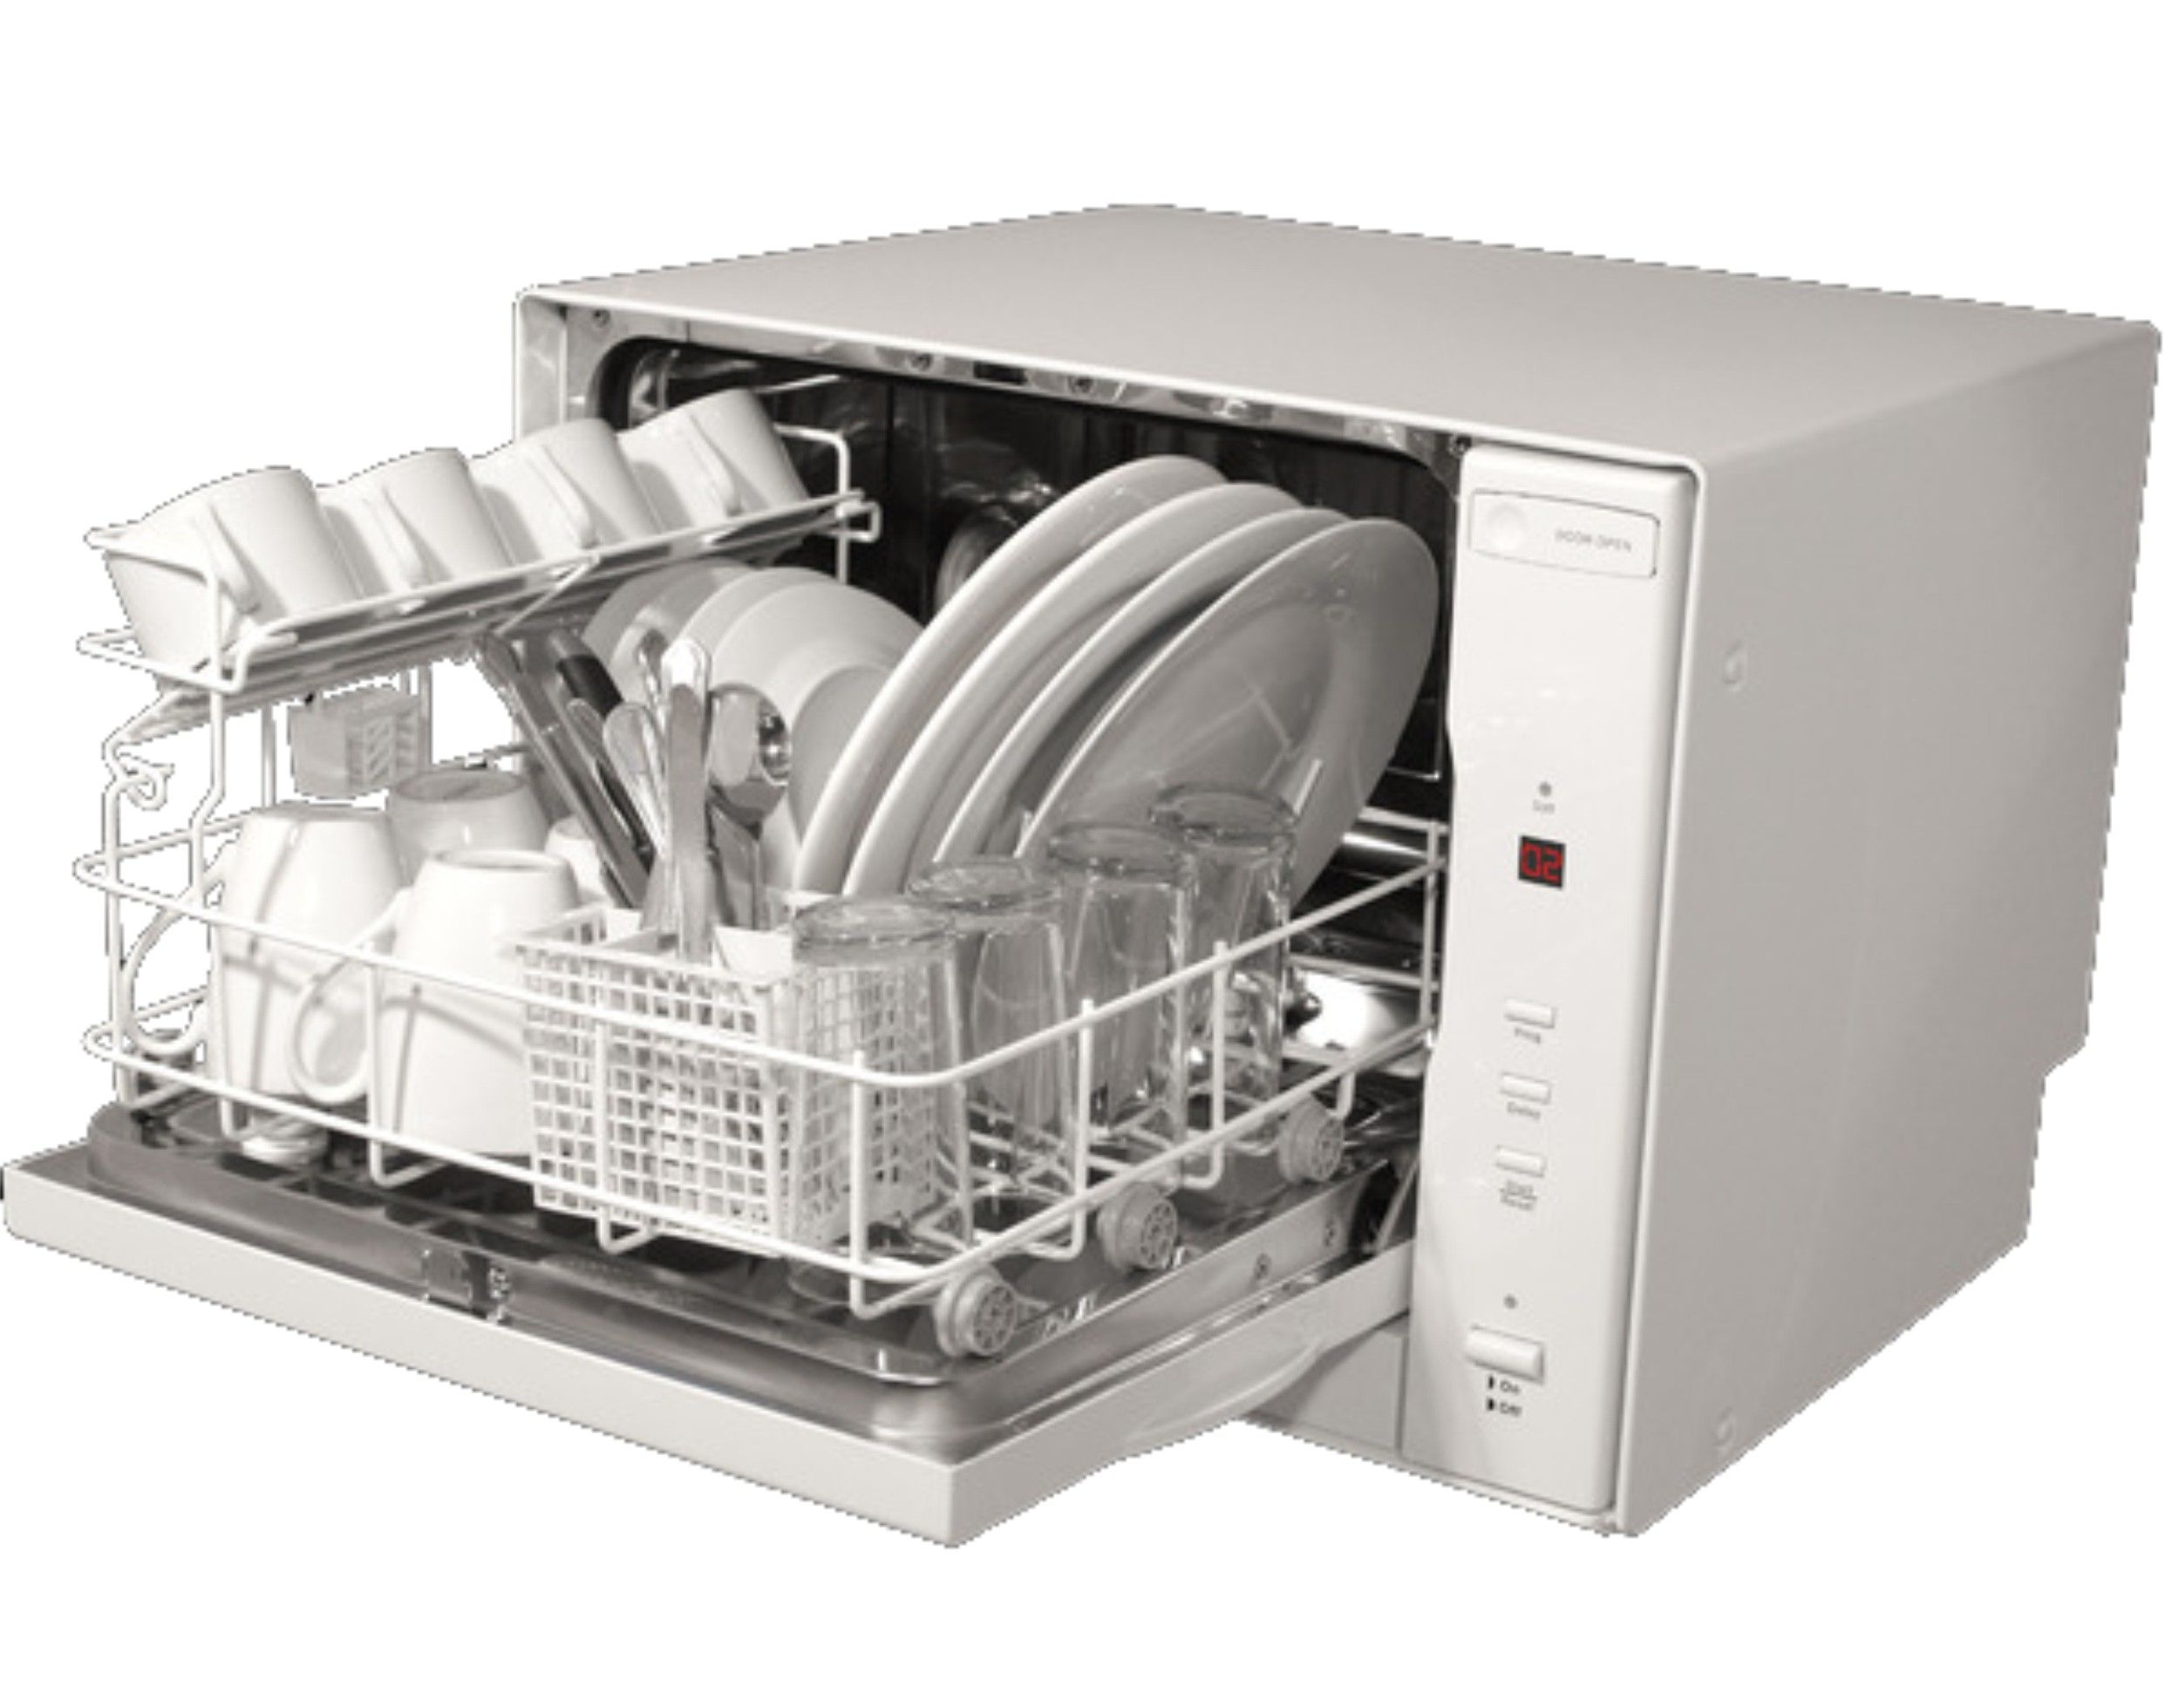 Small Dishwasher For Small Kitchen | Kitchen Sohor